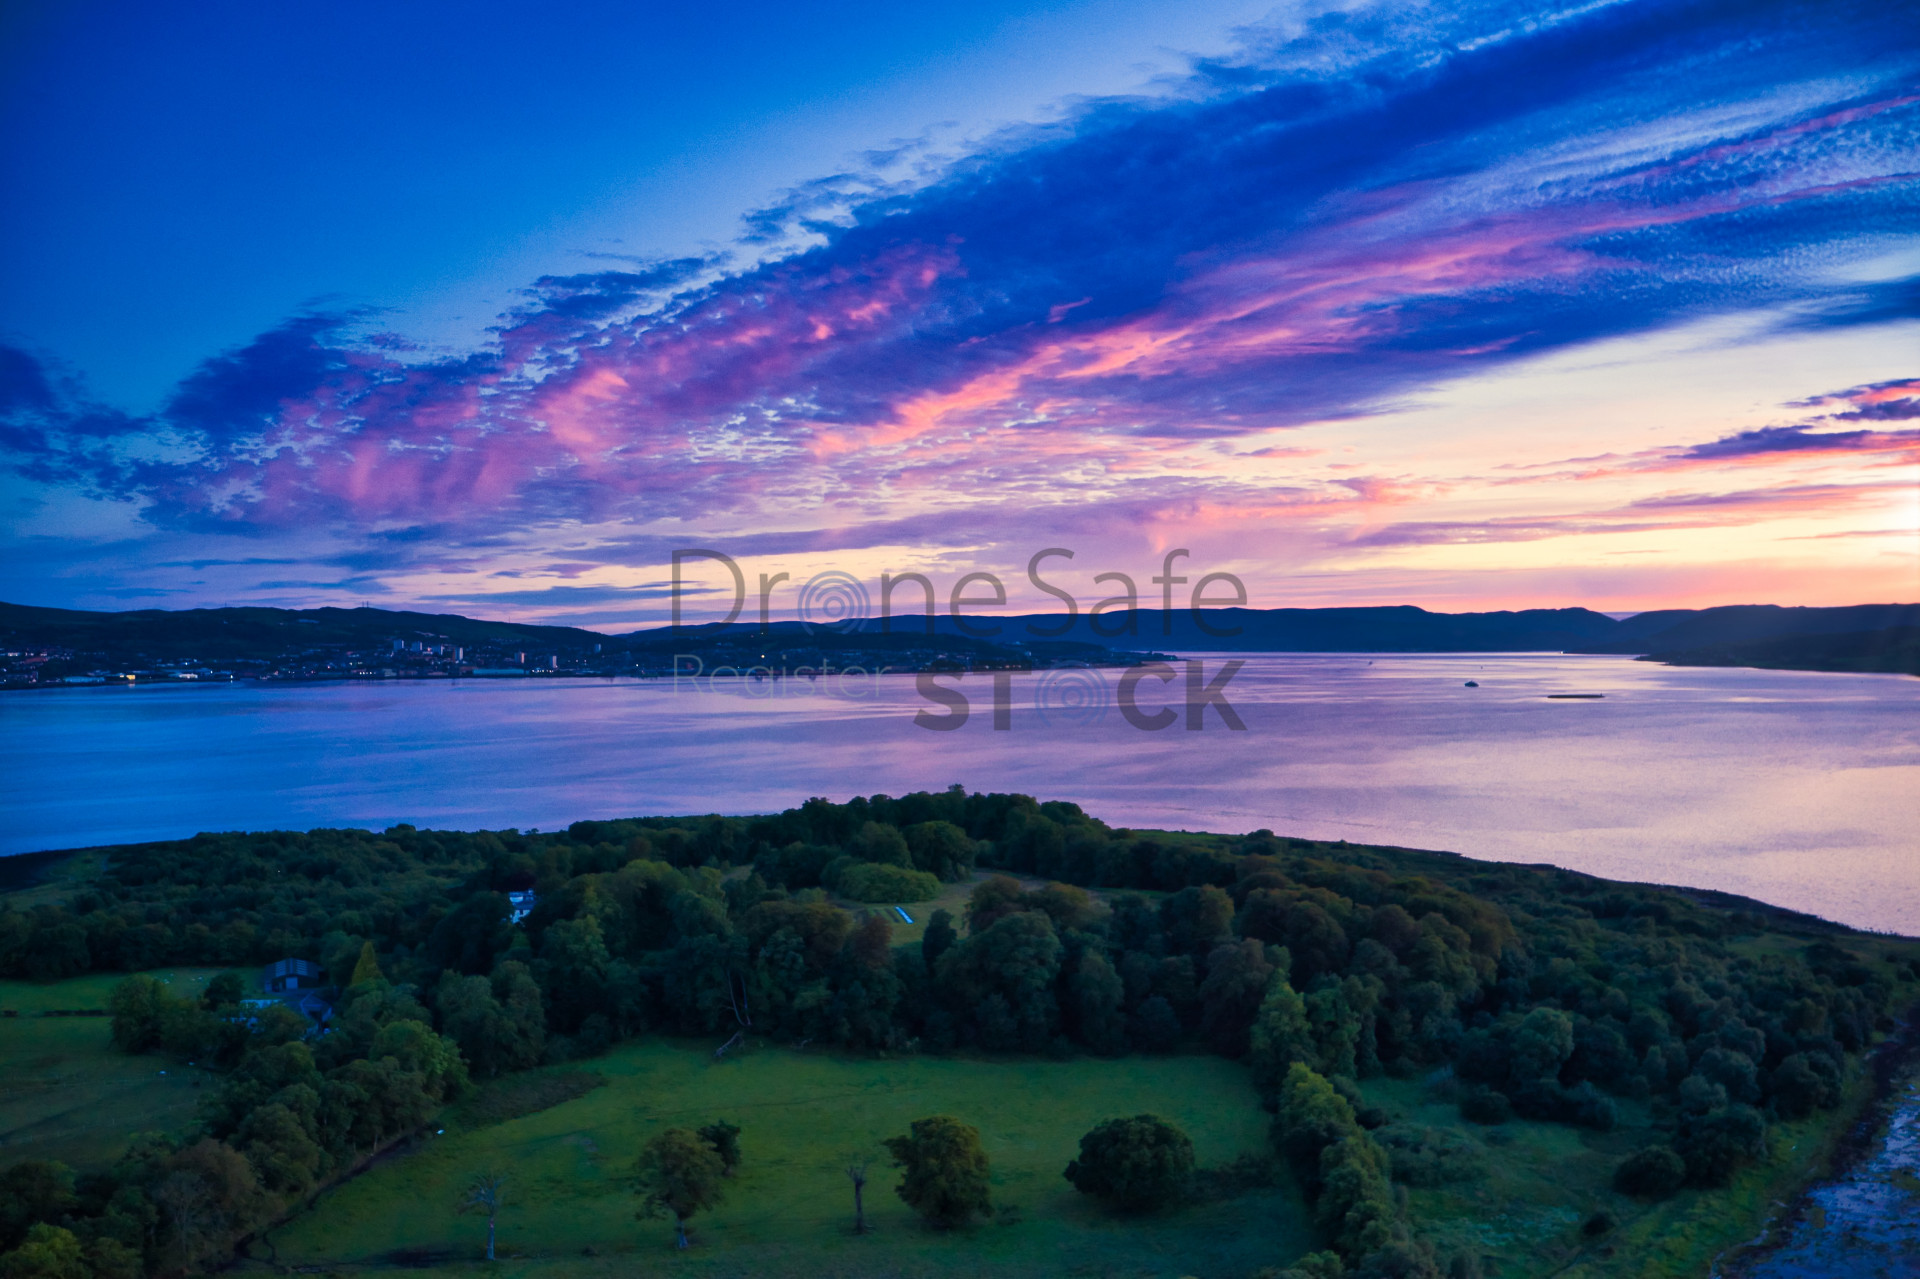 Airview Scotland Ltd